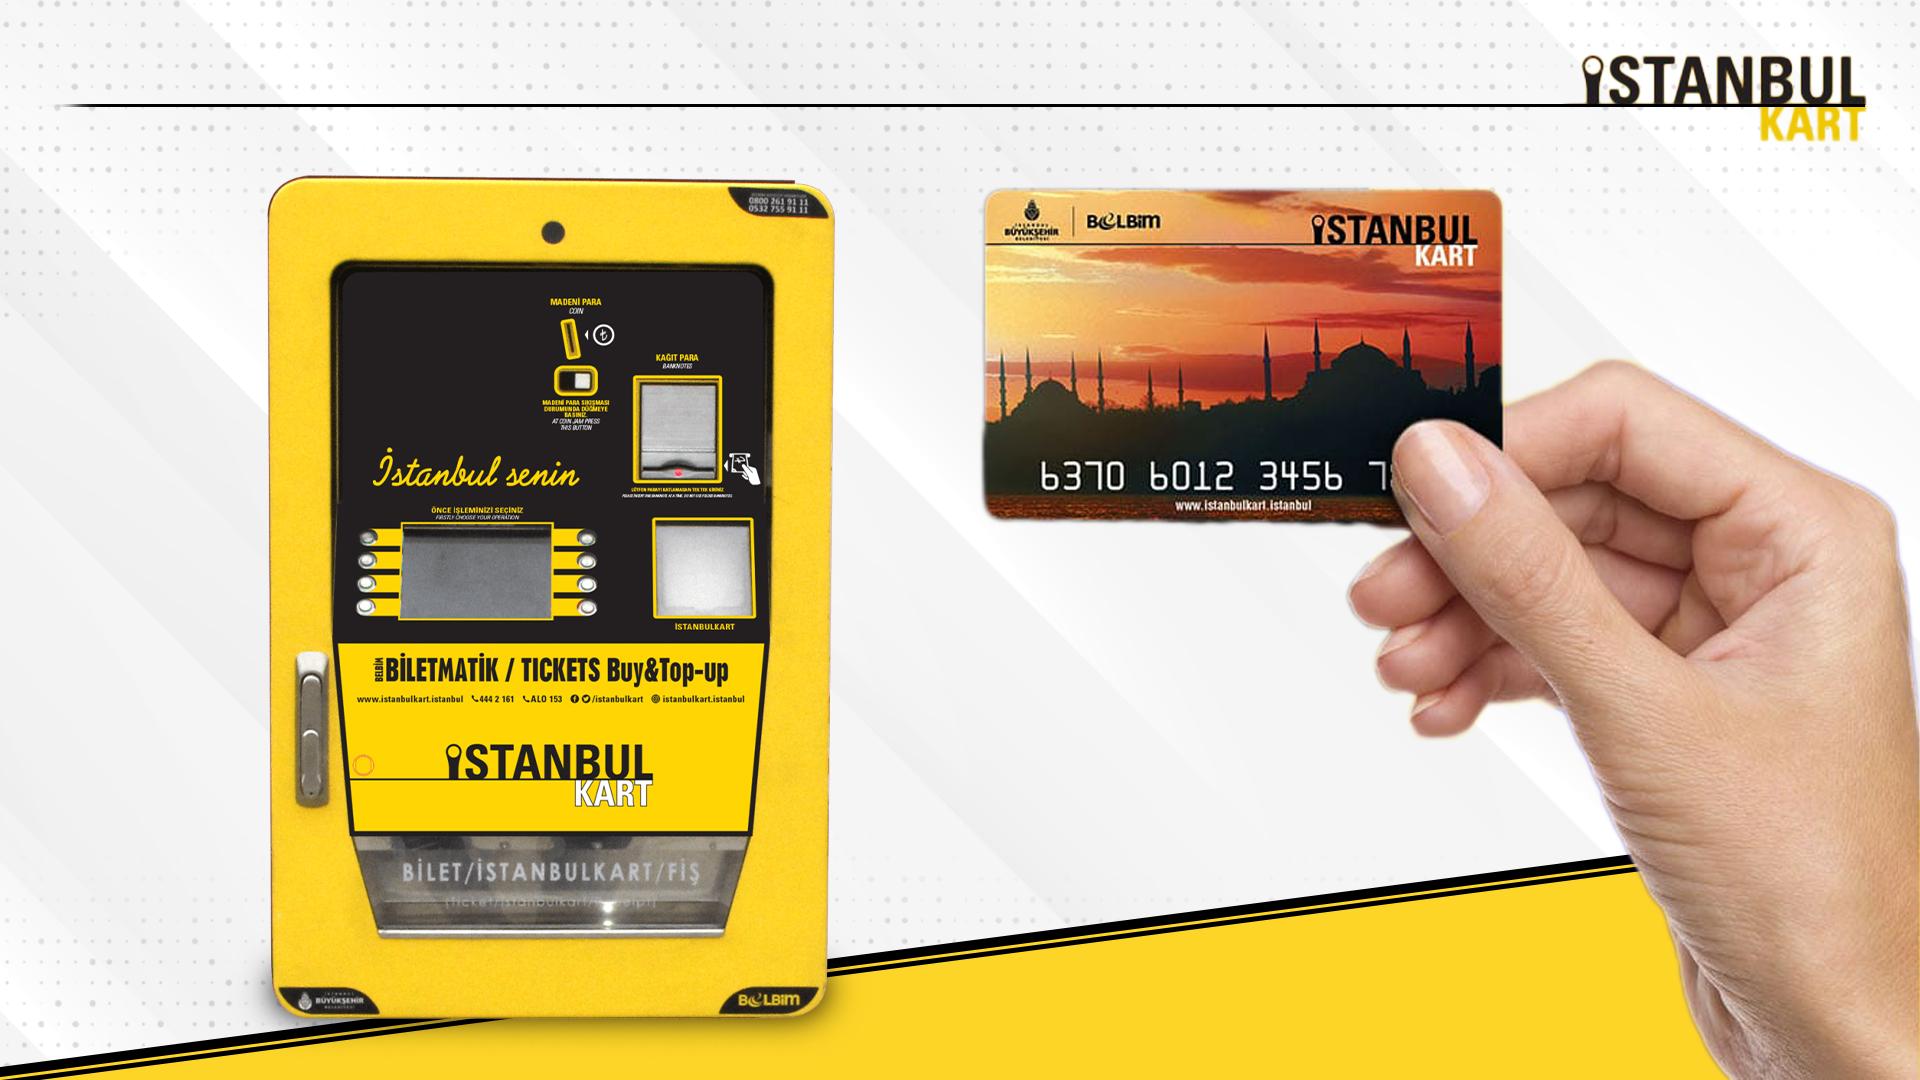 Istanbul card - كرت اسطبنول